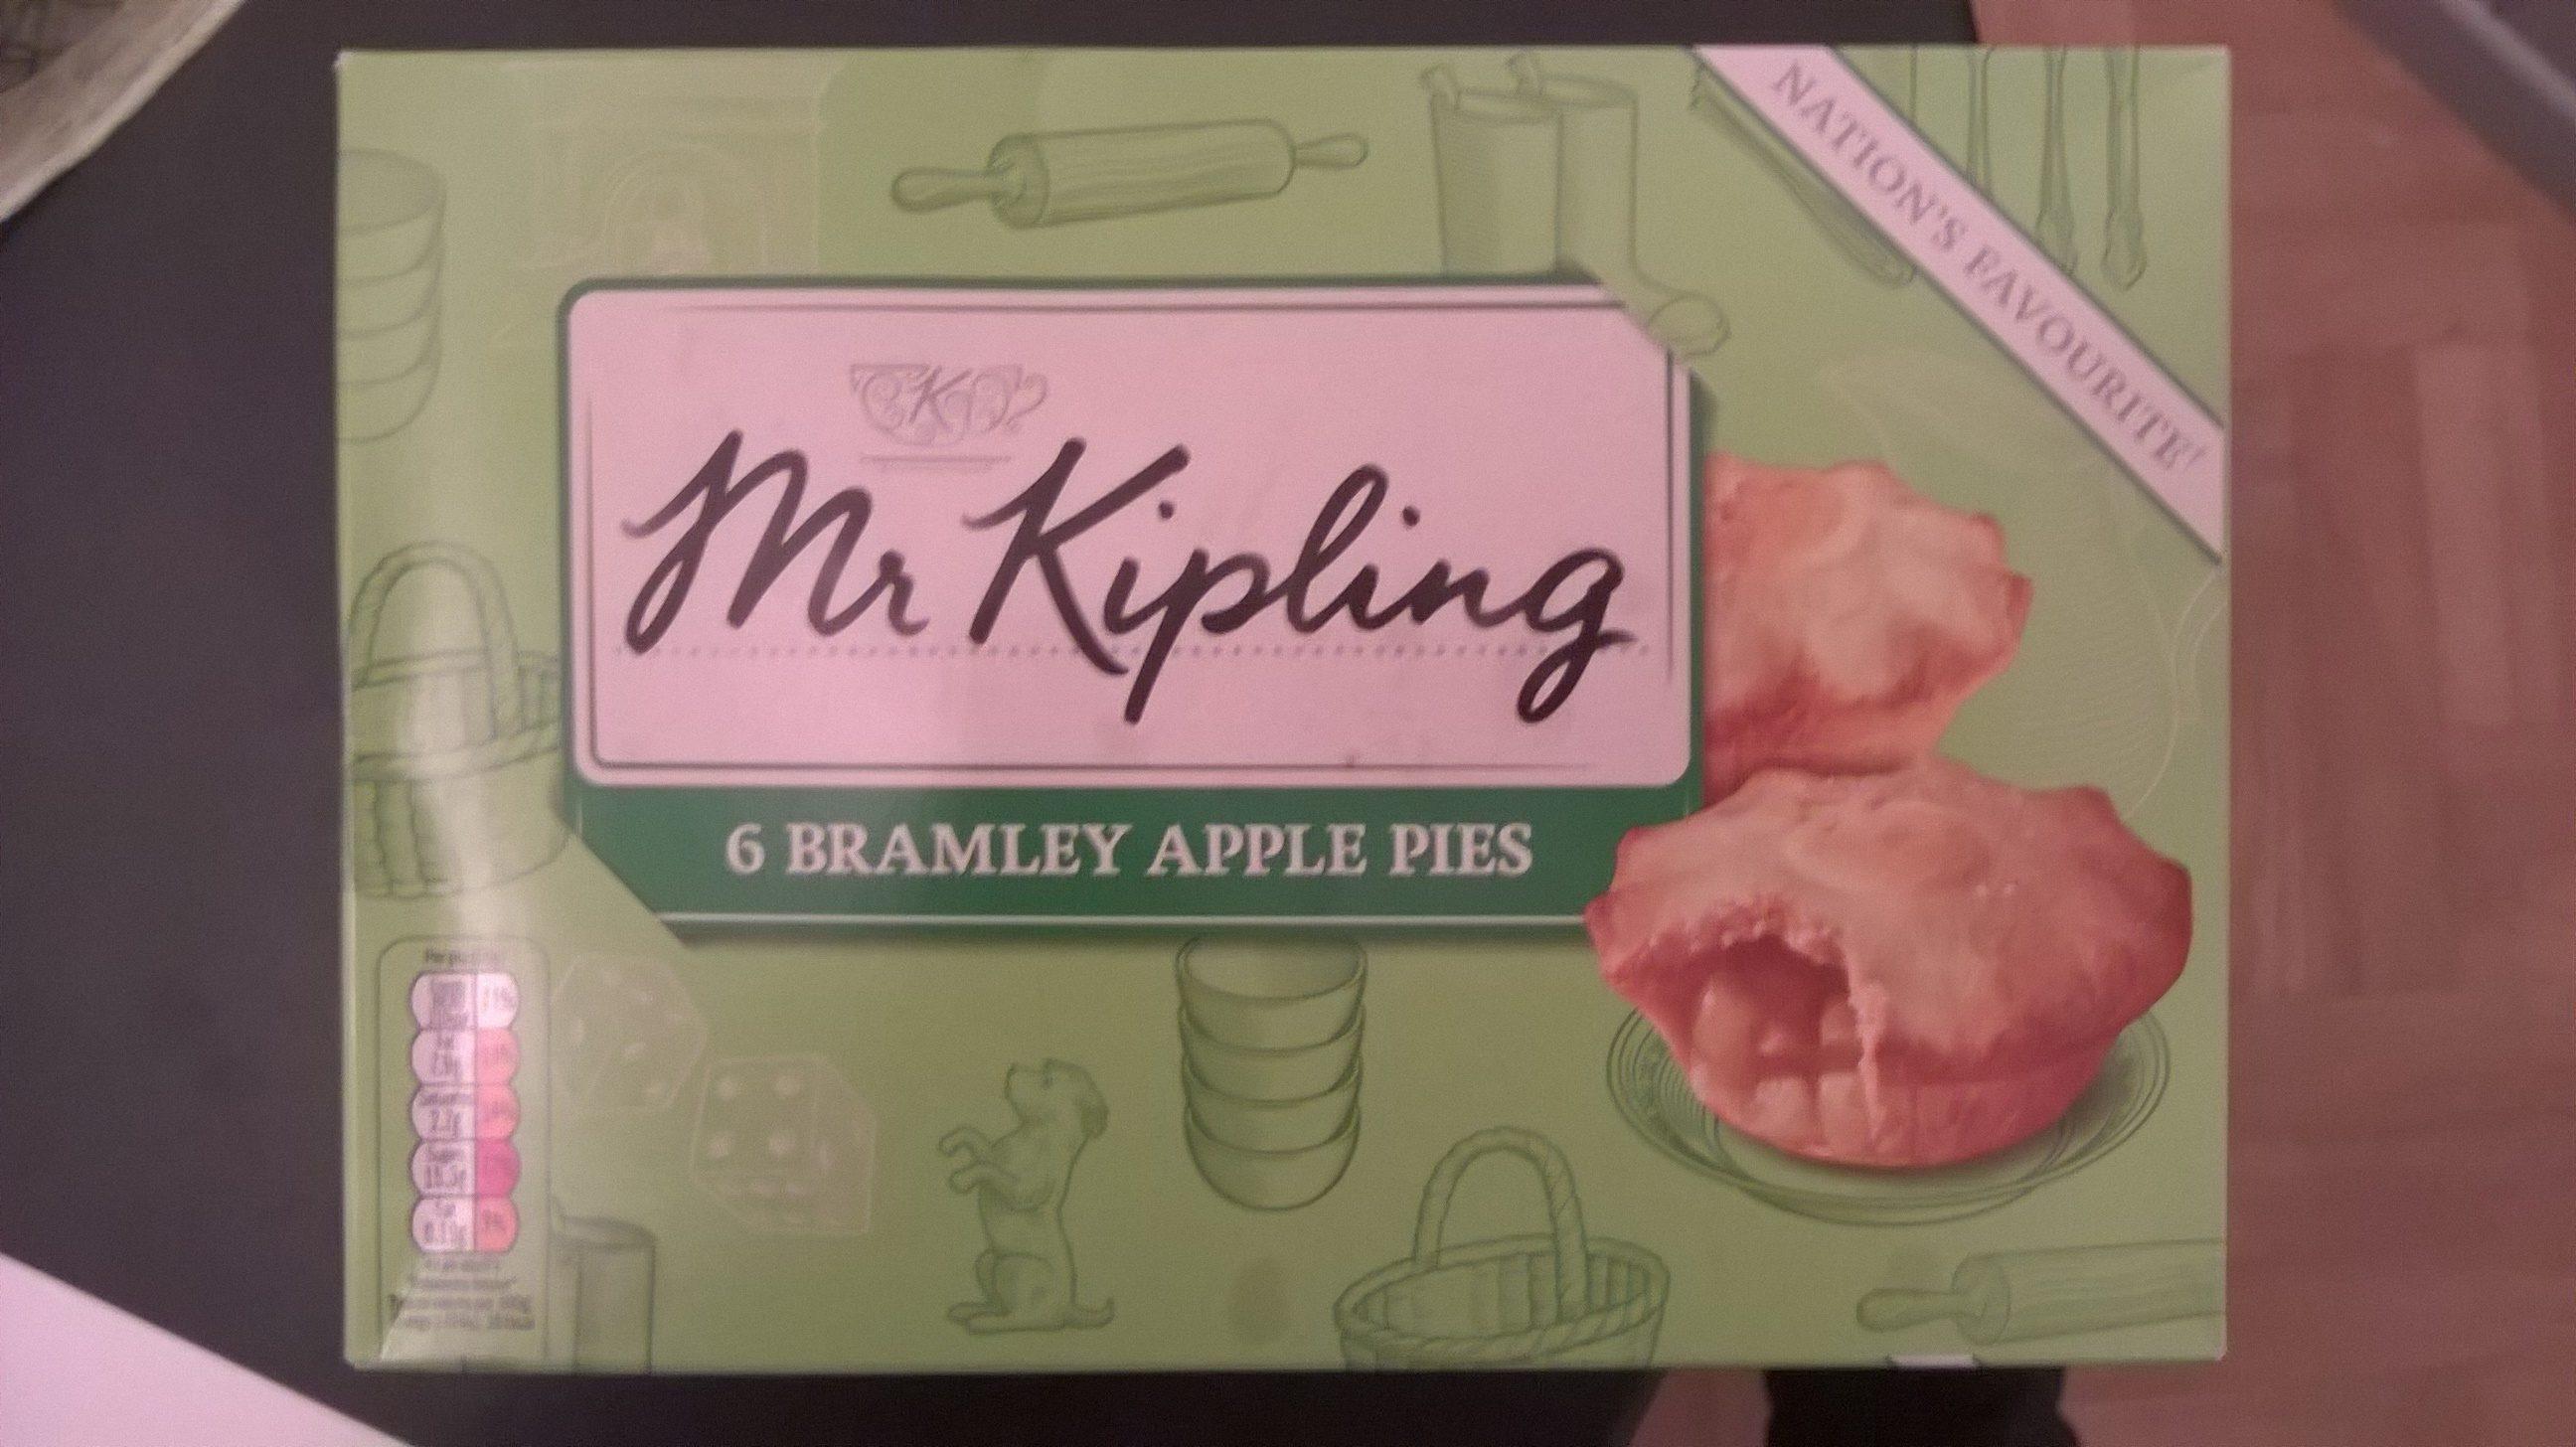 6 Bramley apple Pies - Produit - fr